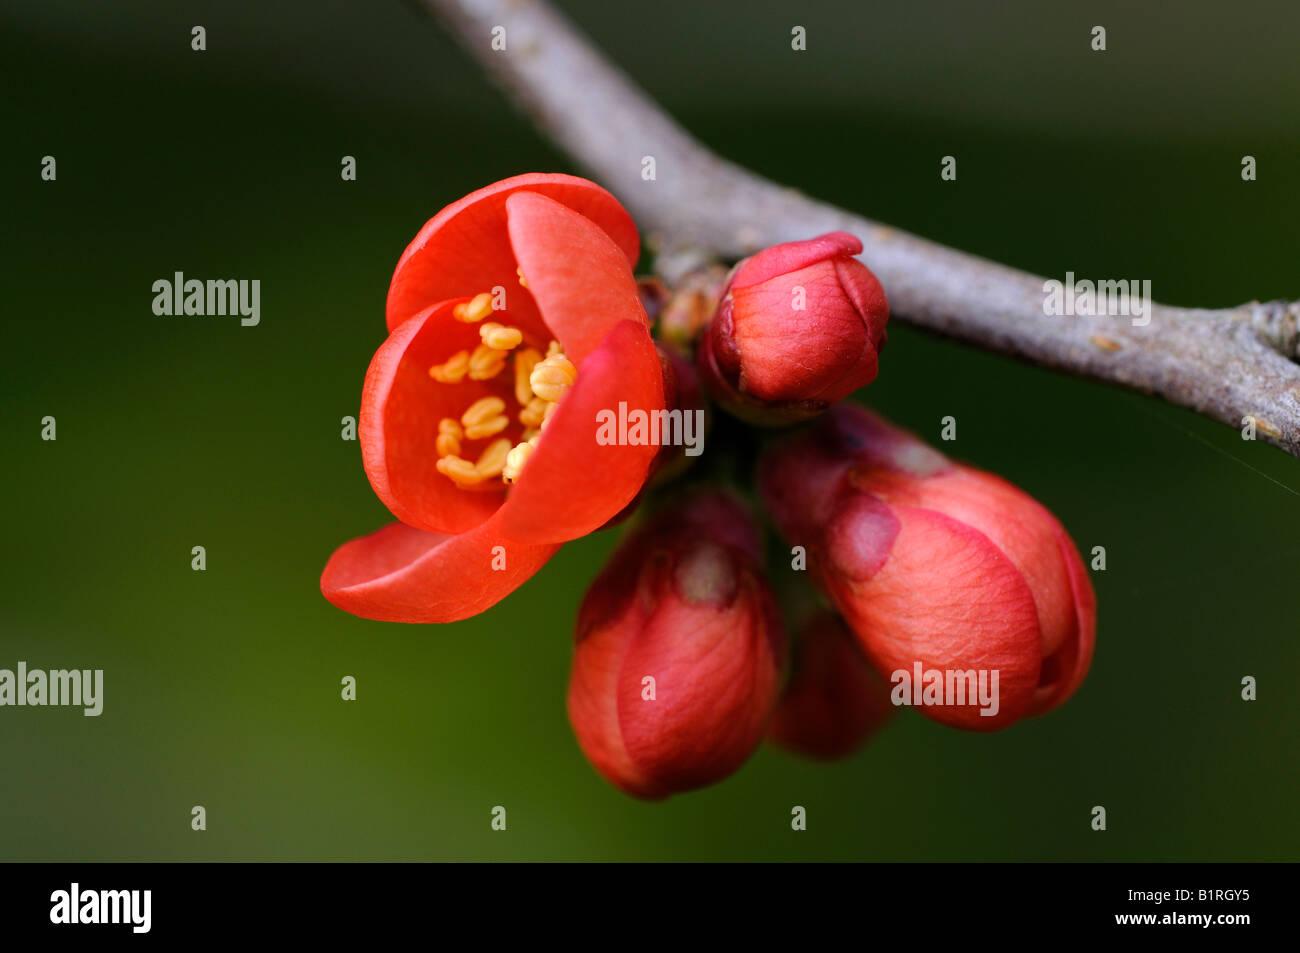 Japanese Chaenomeles (Chaenomeles japonica) Stock Photo